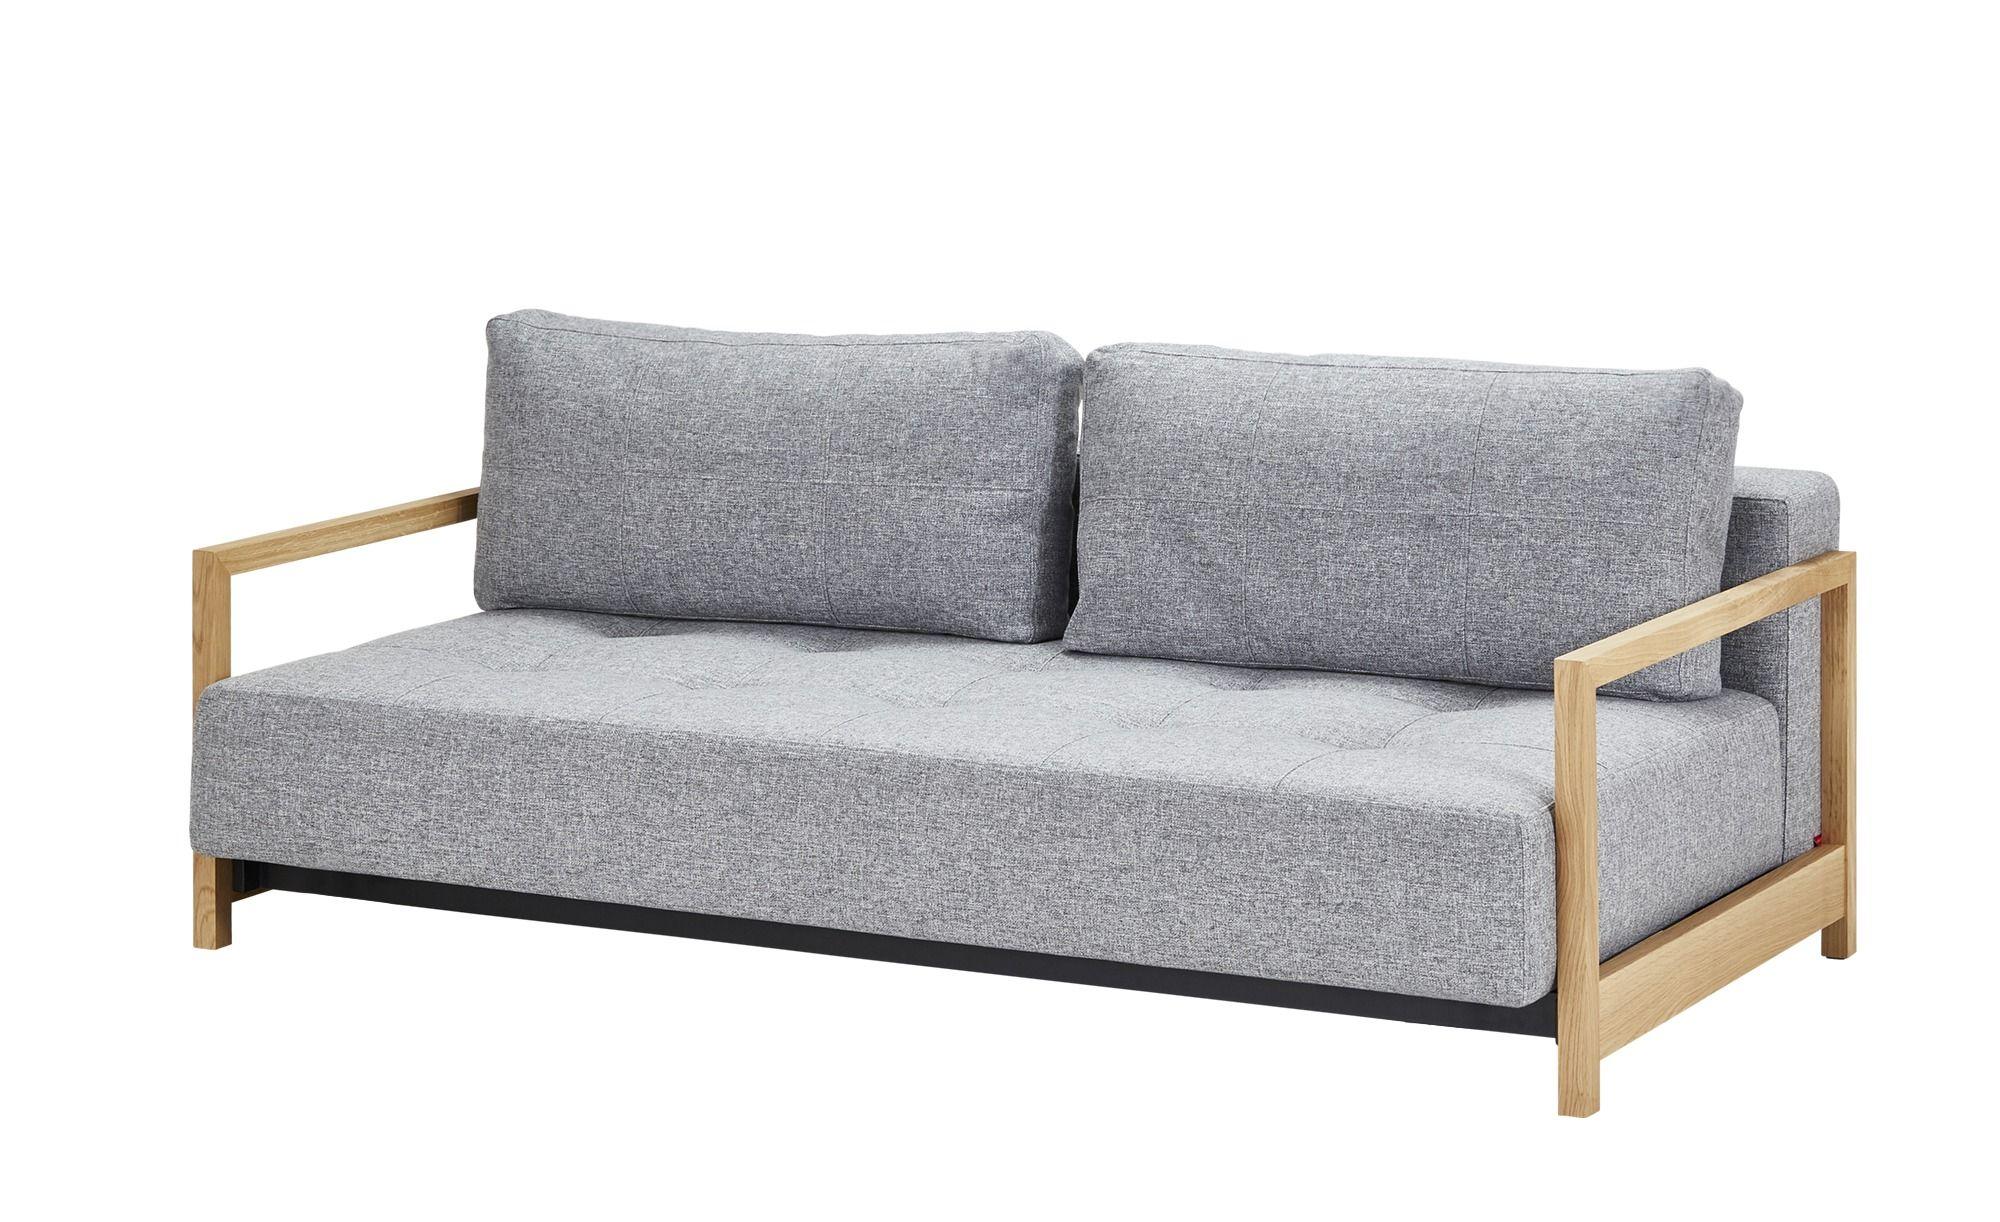 Design Schlafsofa Grau Webstoff Akkito In 2019 Outdoor Sofa